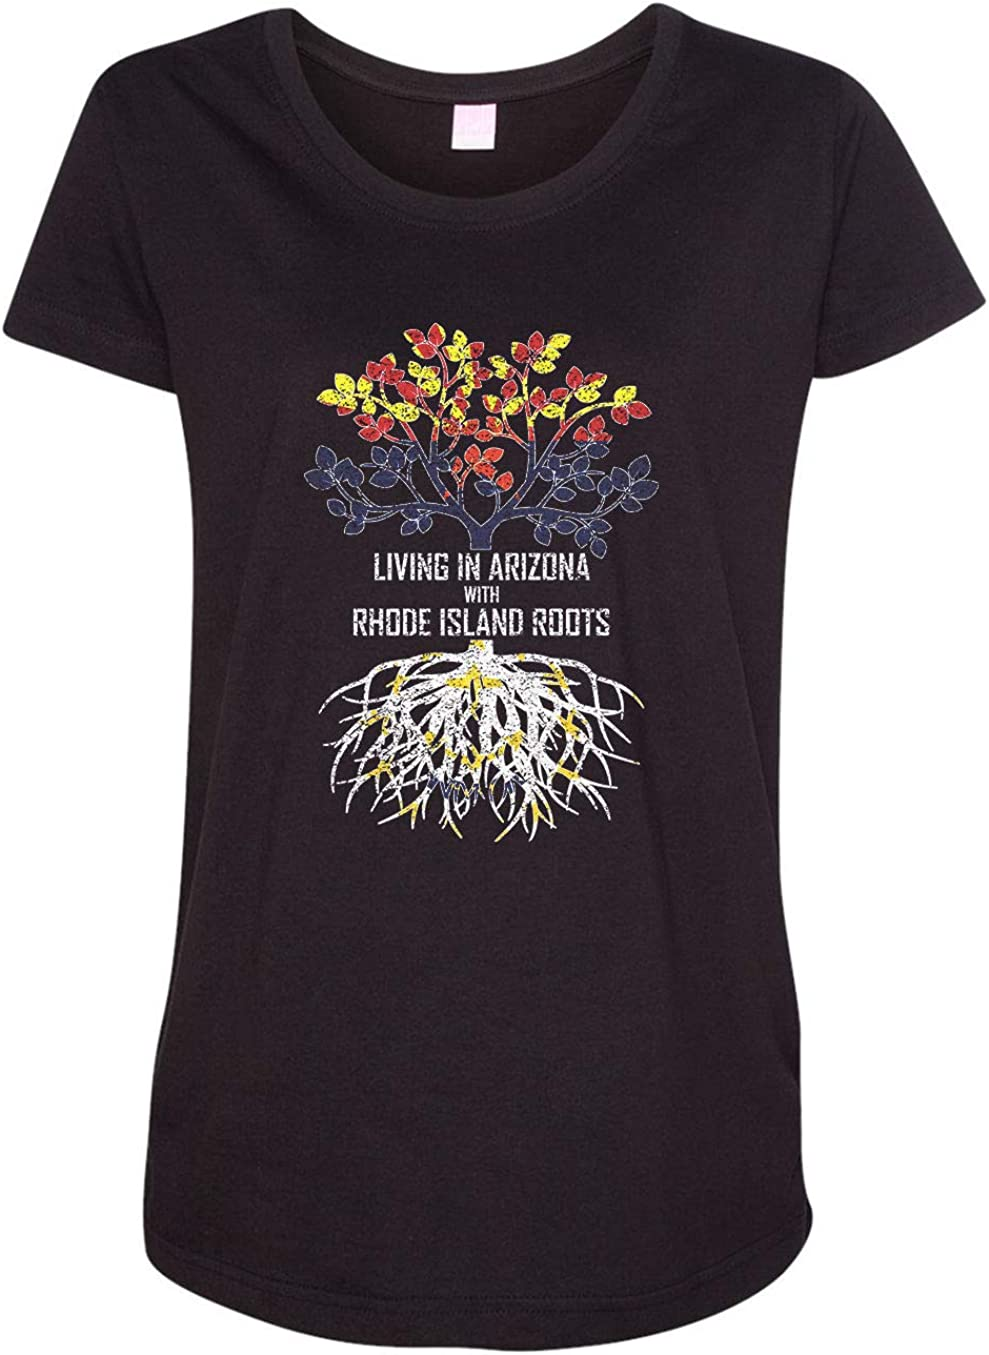 HARD EDGE DESIGN Women's Living in Arizona with Rhode Island Roots T-Shirt